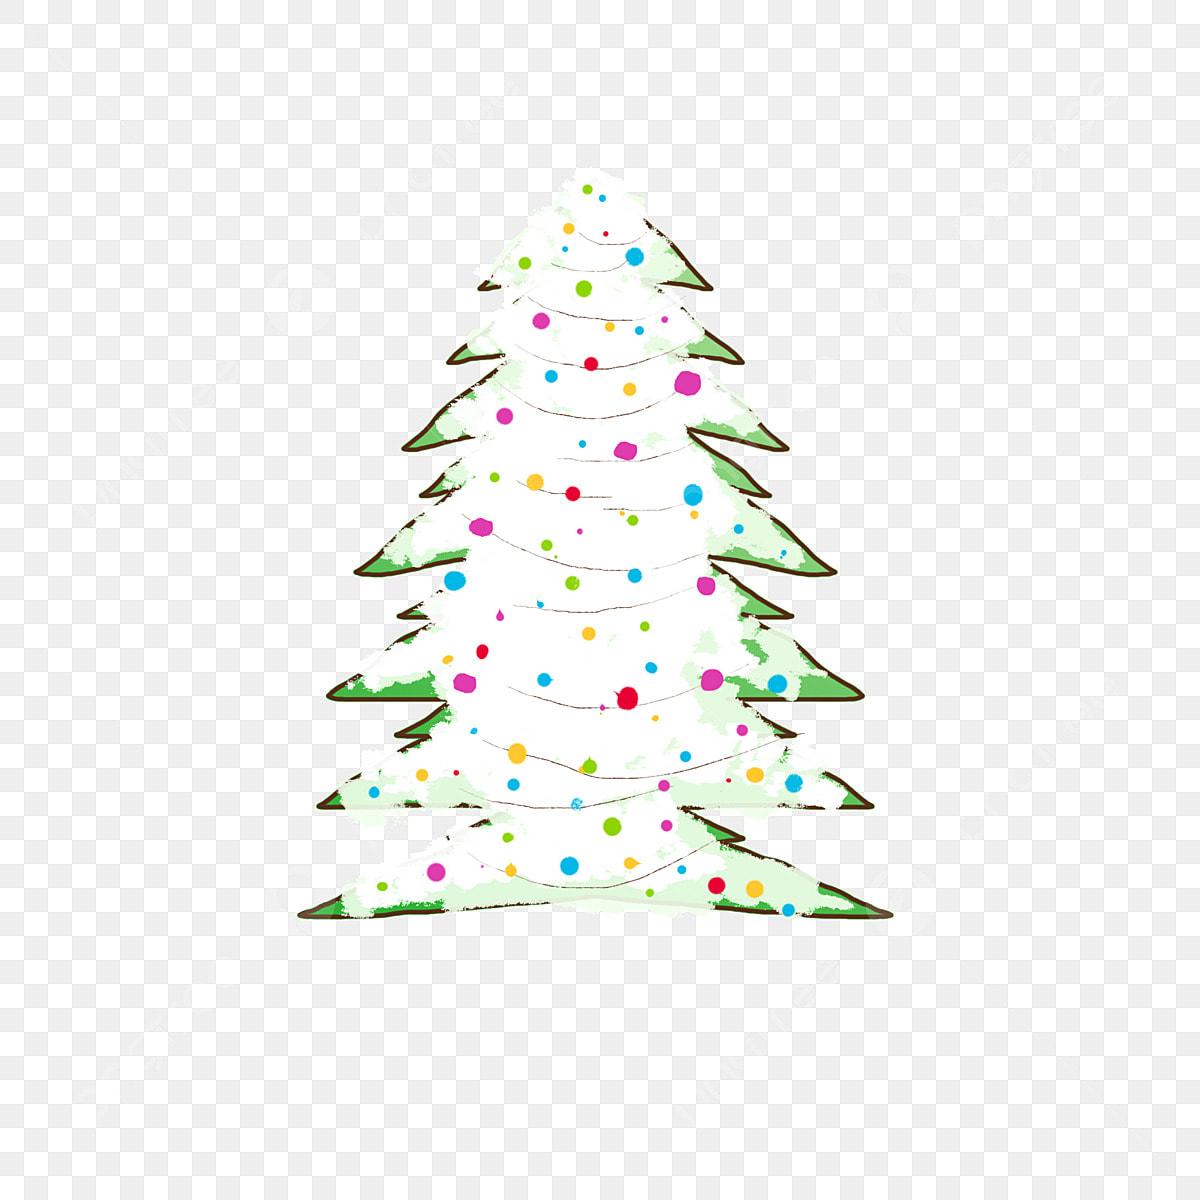 Weihnachten Clipart Bilder.Green Christmas Tree Line Weihnachten Weihnachten Clipart Abgedeckt